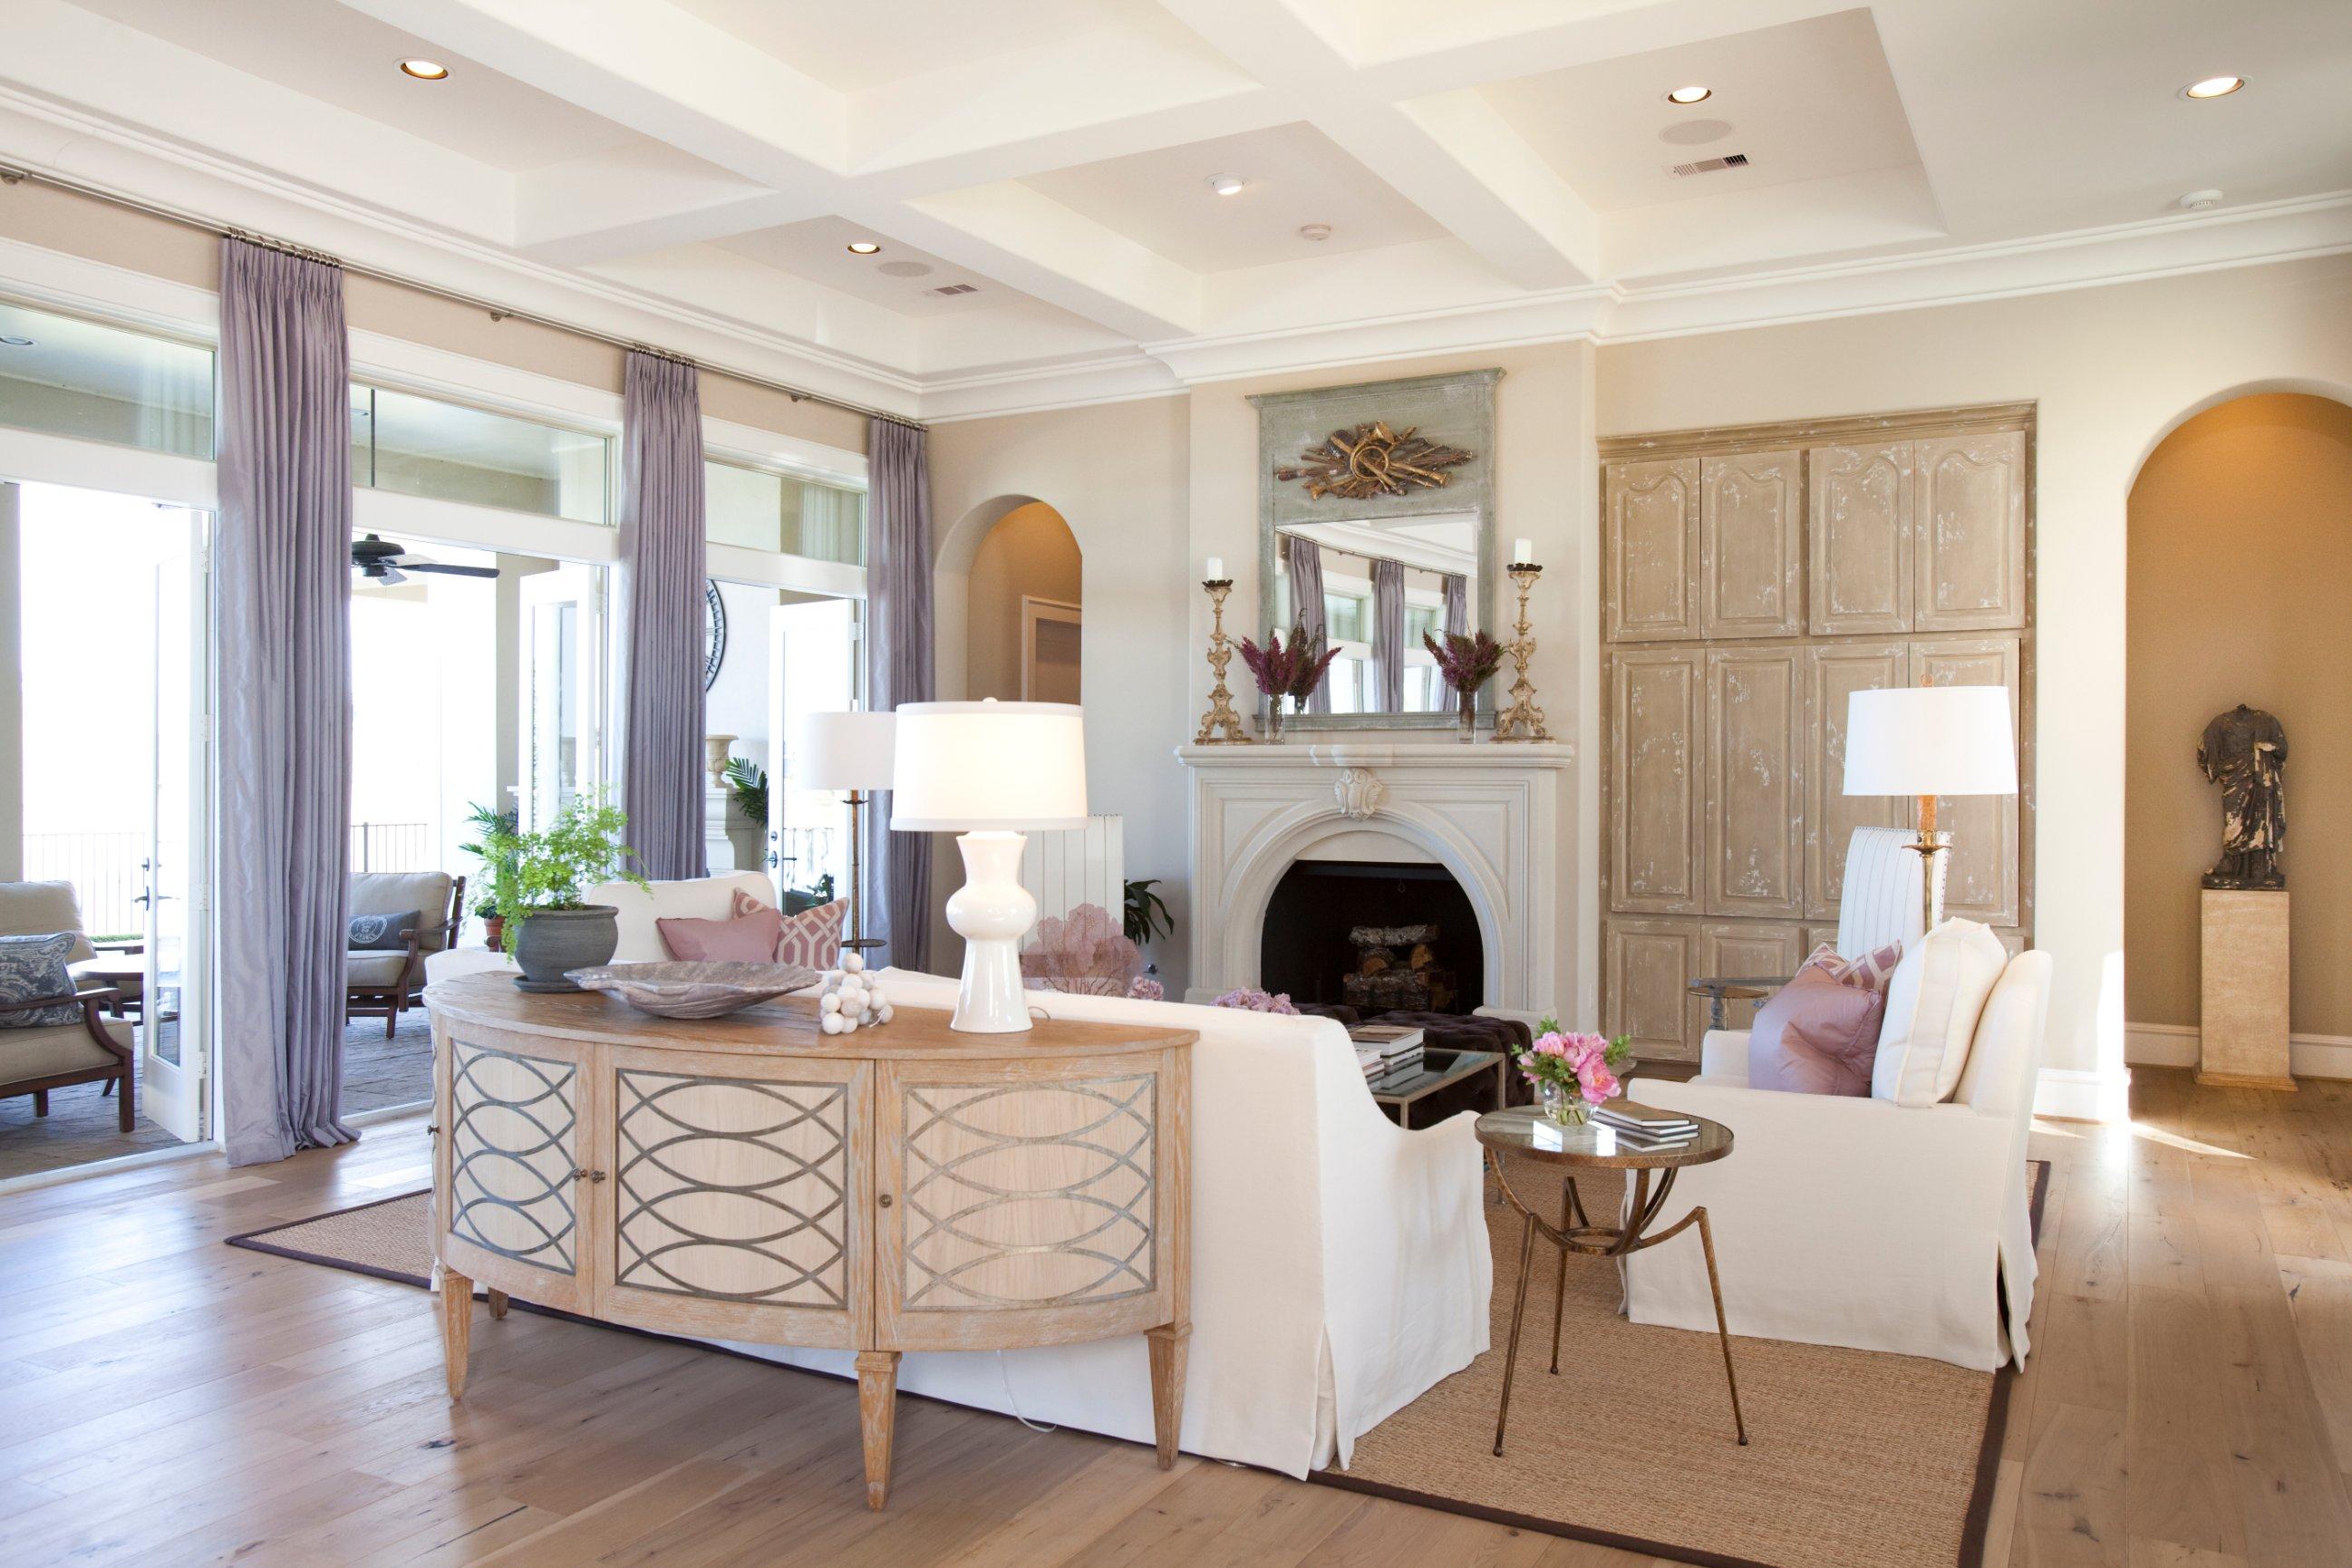 x s lula pin b n tx isenhour by high wide furniture comfortable booth dallas pinteres stylish riverfront blvd deep sofa